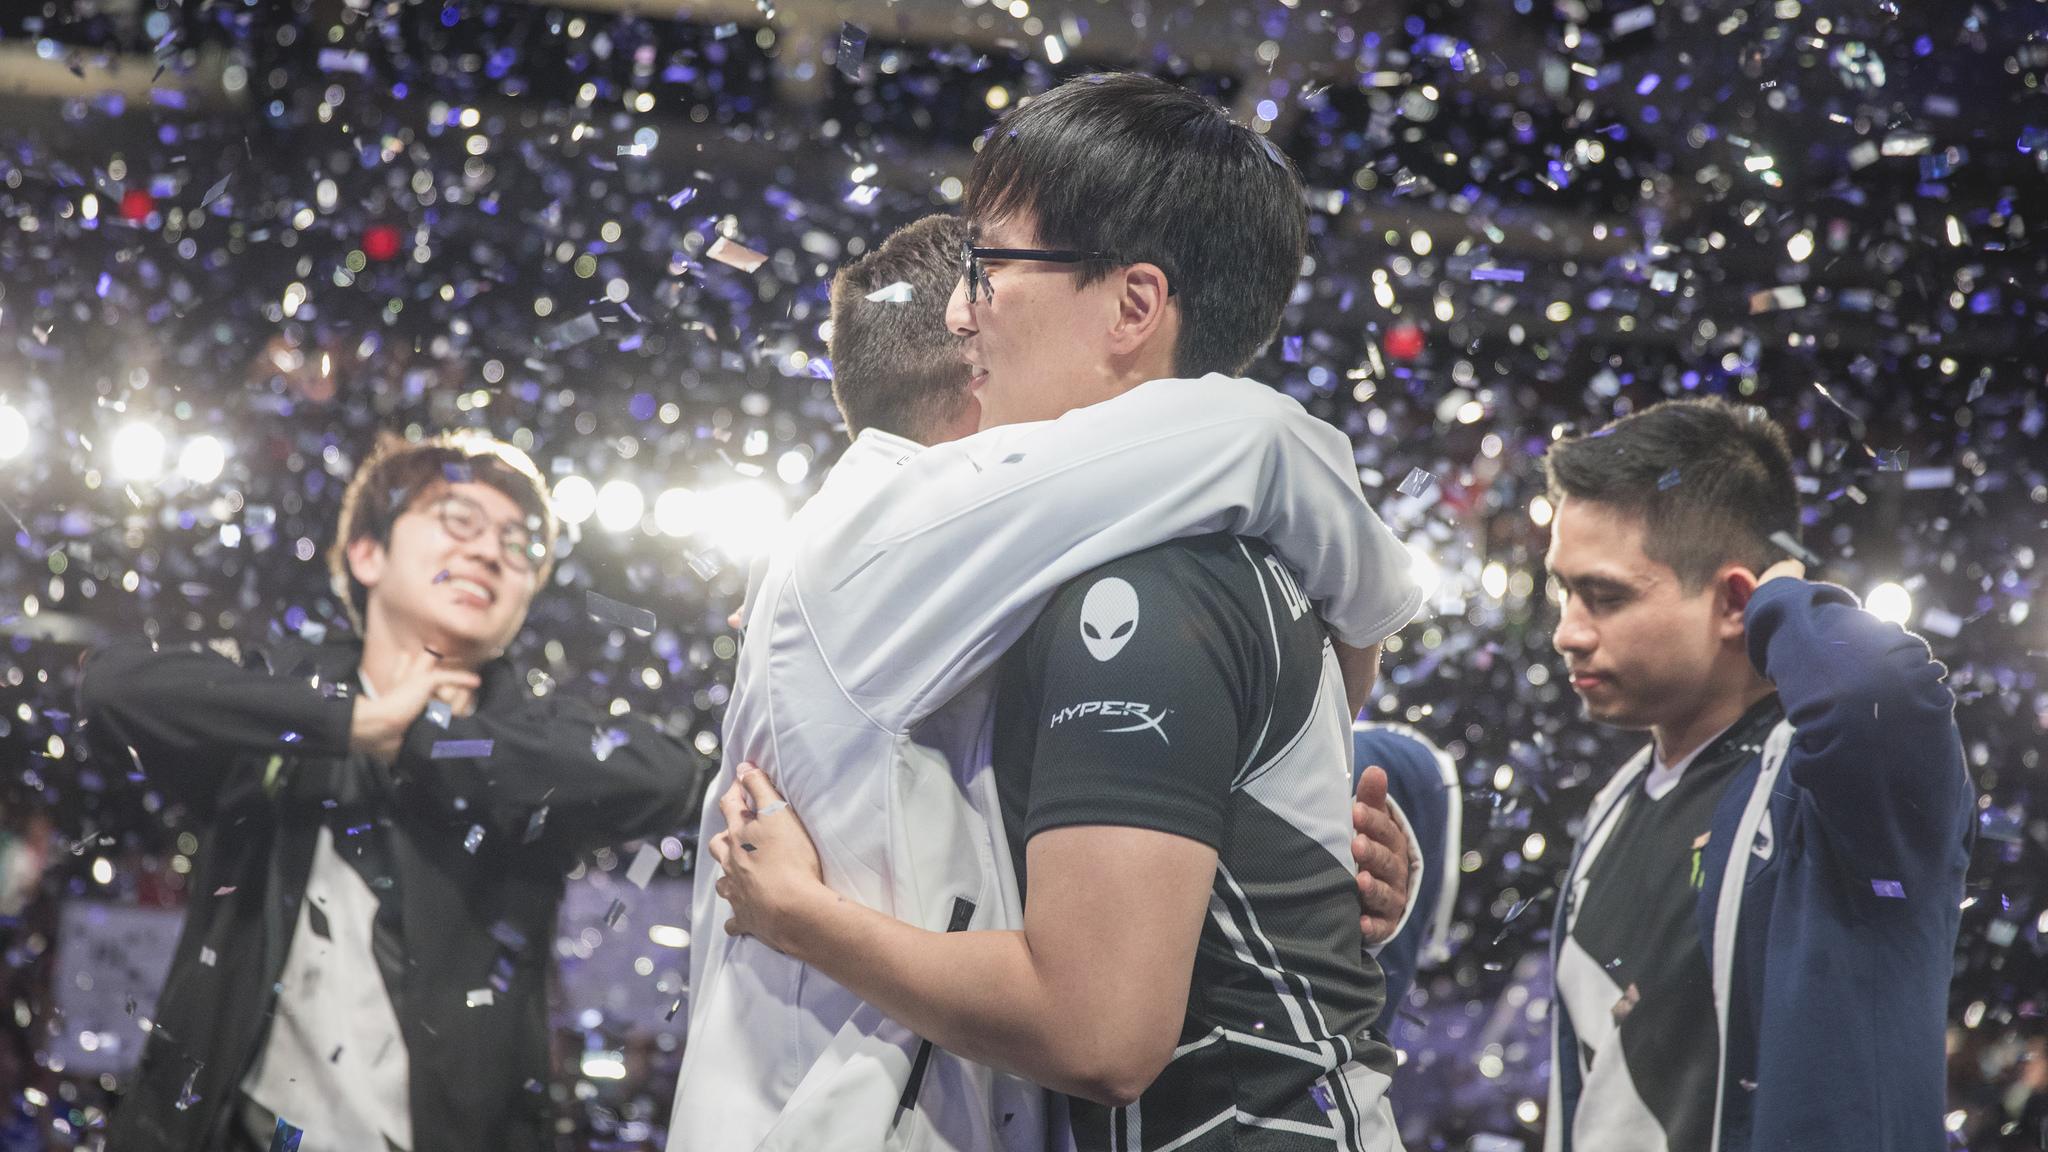 College boys hugging after winning esports championship as confetti falls.